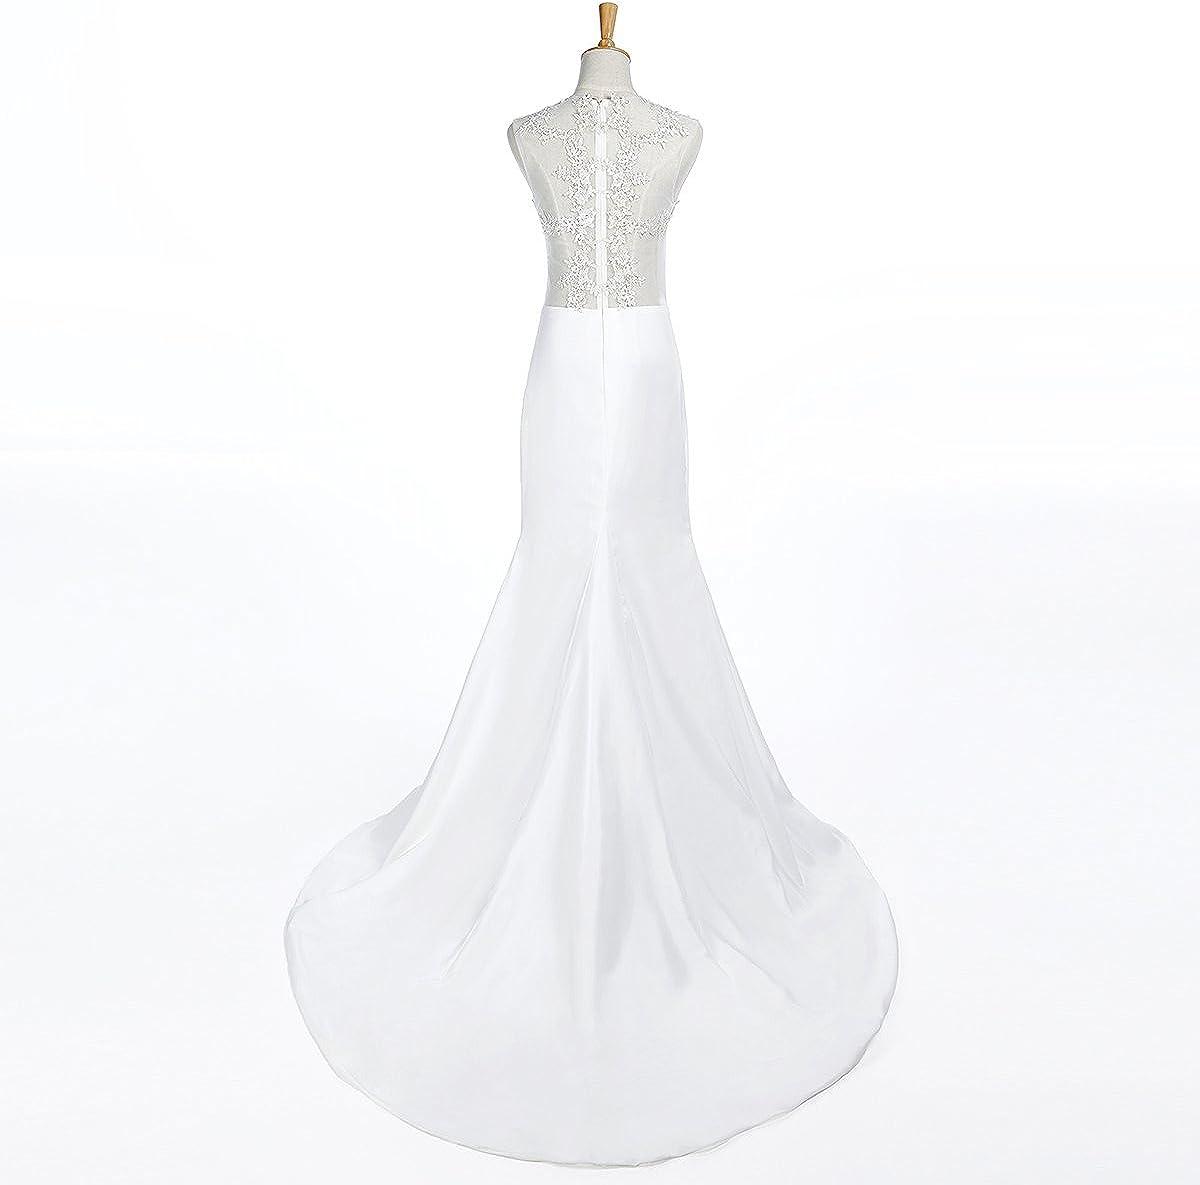 Ruiyuhong Womens Mermaid Lace Long Evening Gown Beach Wedding Dress DS38